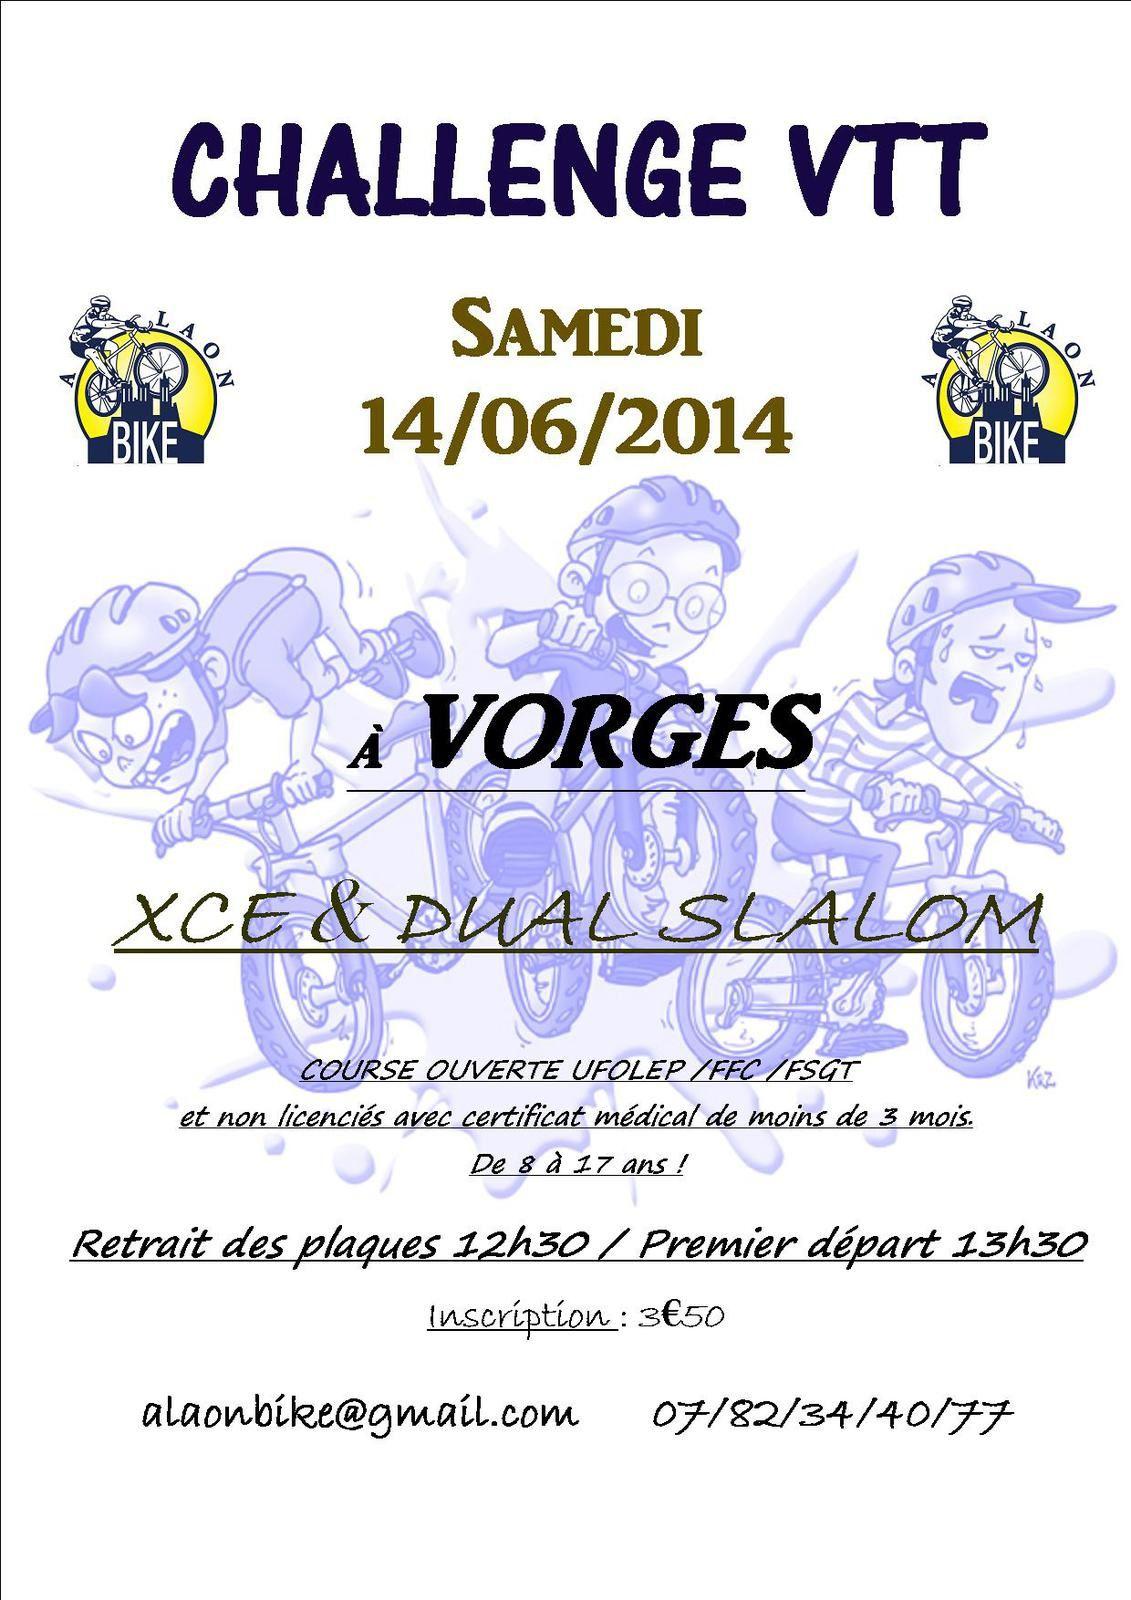 CHALLENGE VTT 14/06/2014